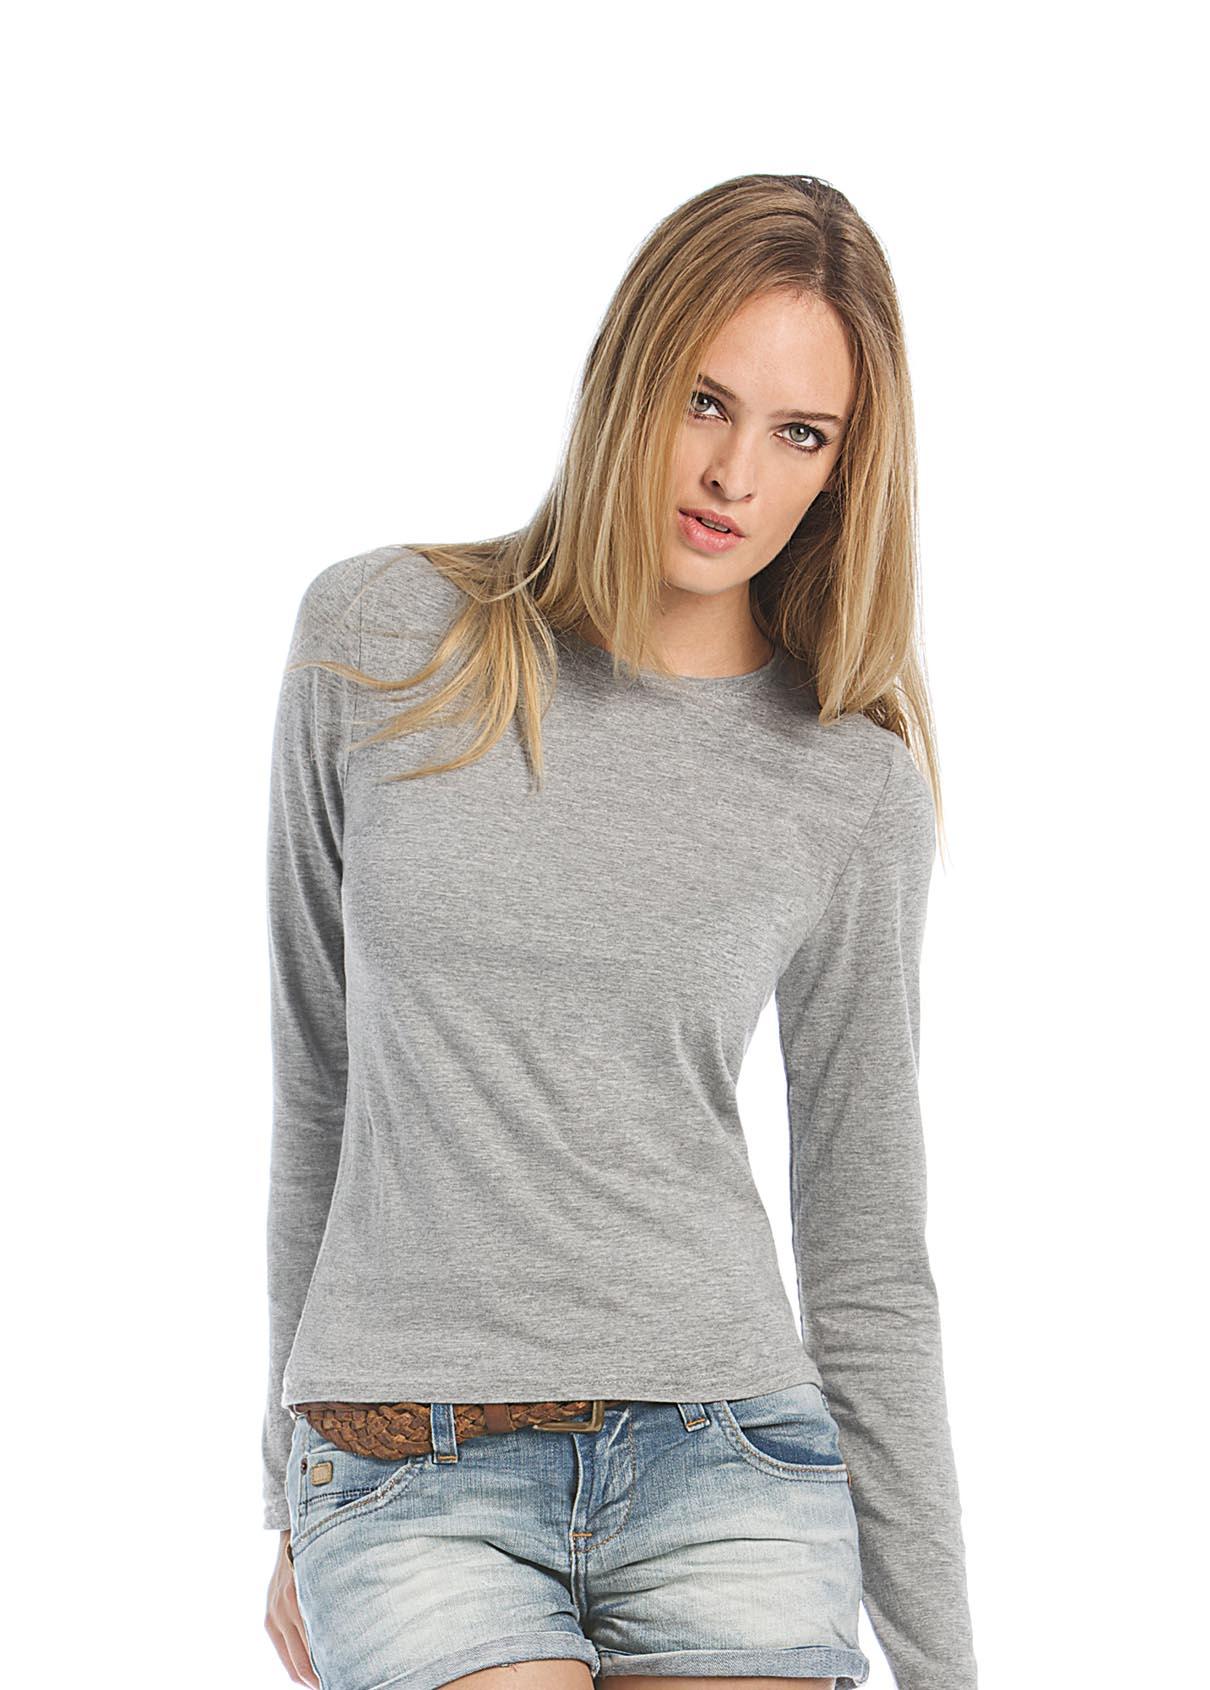 tee_shirt_femme_manches_longues_150gr_à_personnaliser